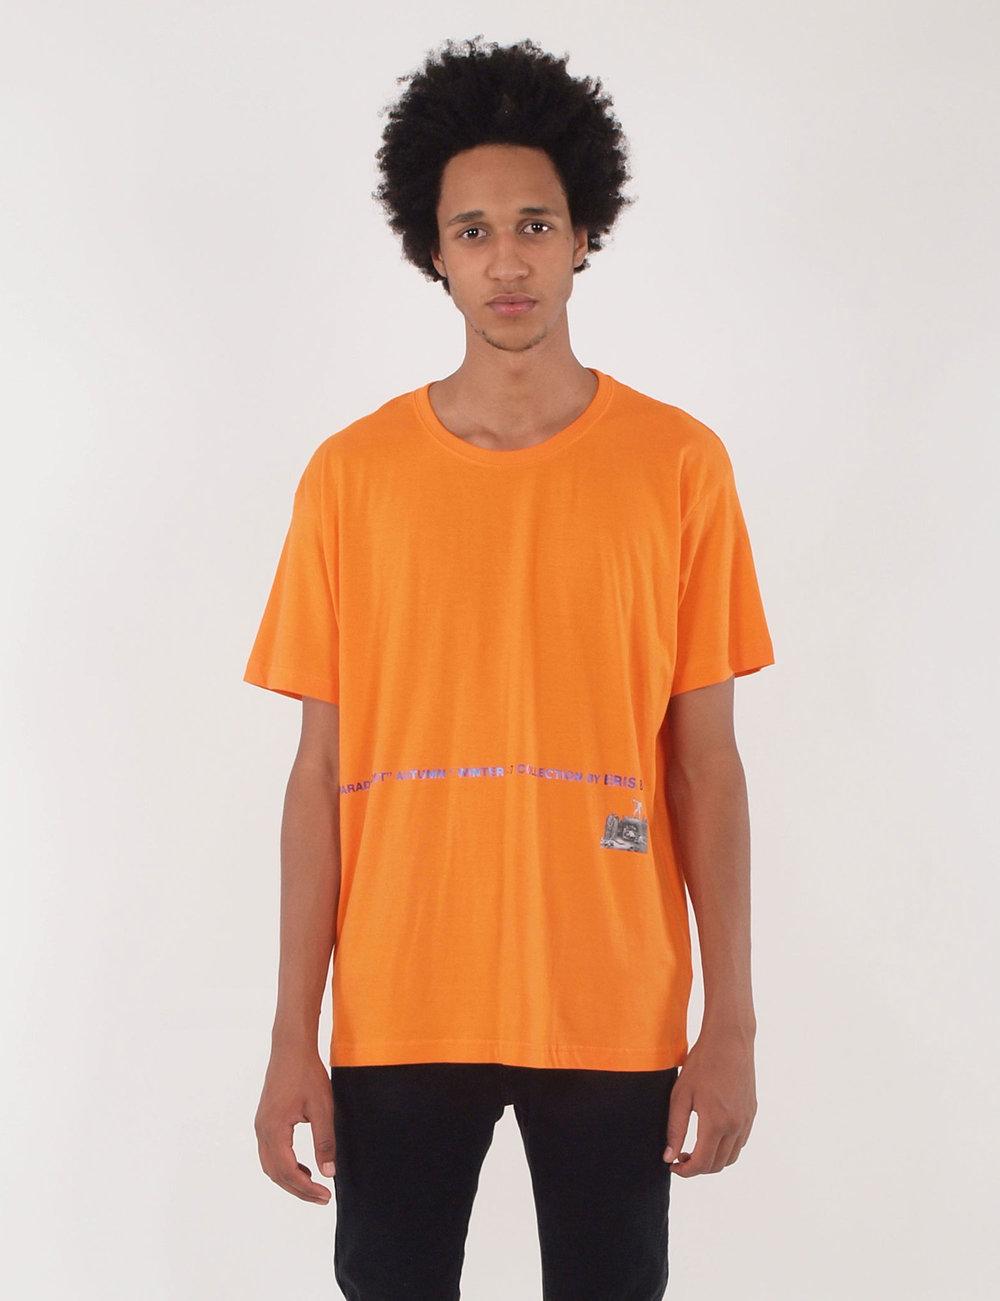 orange-t.jpg